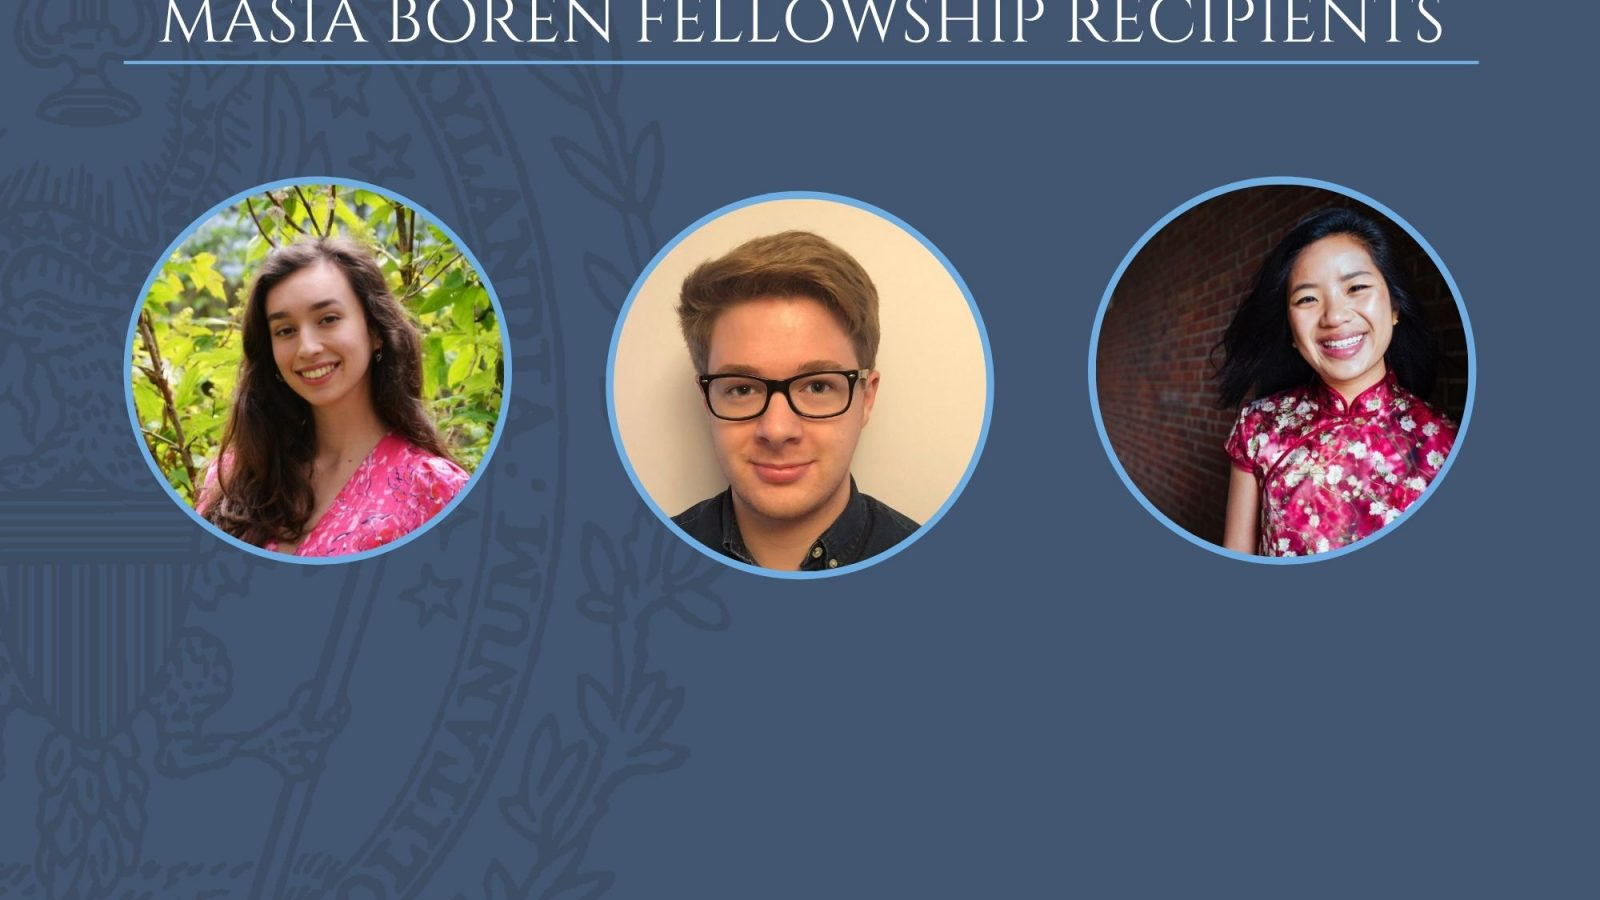 MASIA Boren Fellowship Recipients Bailey Brya, Greg Wood, Sophie Wright